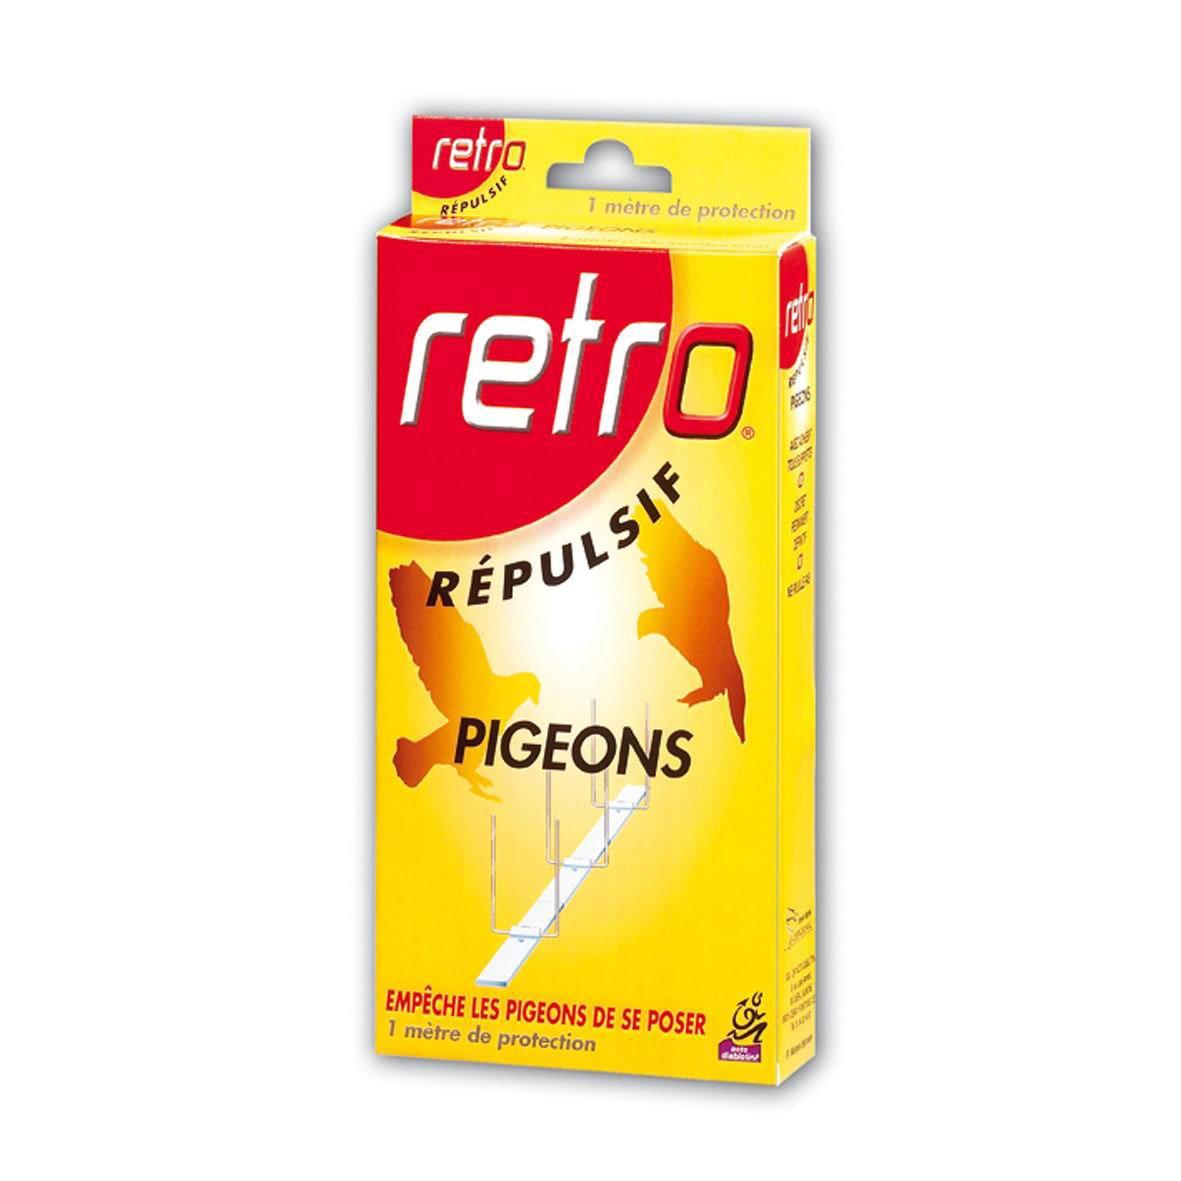 repulsif pigeon leroy merlin